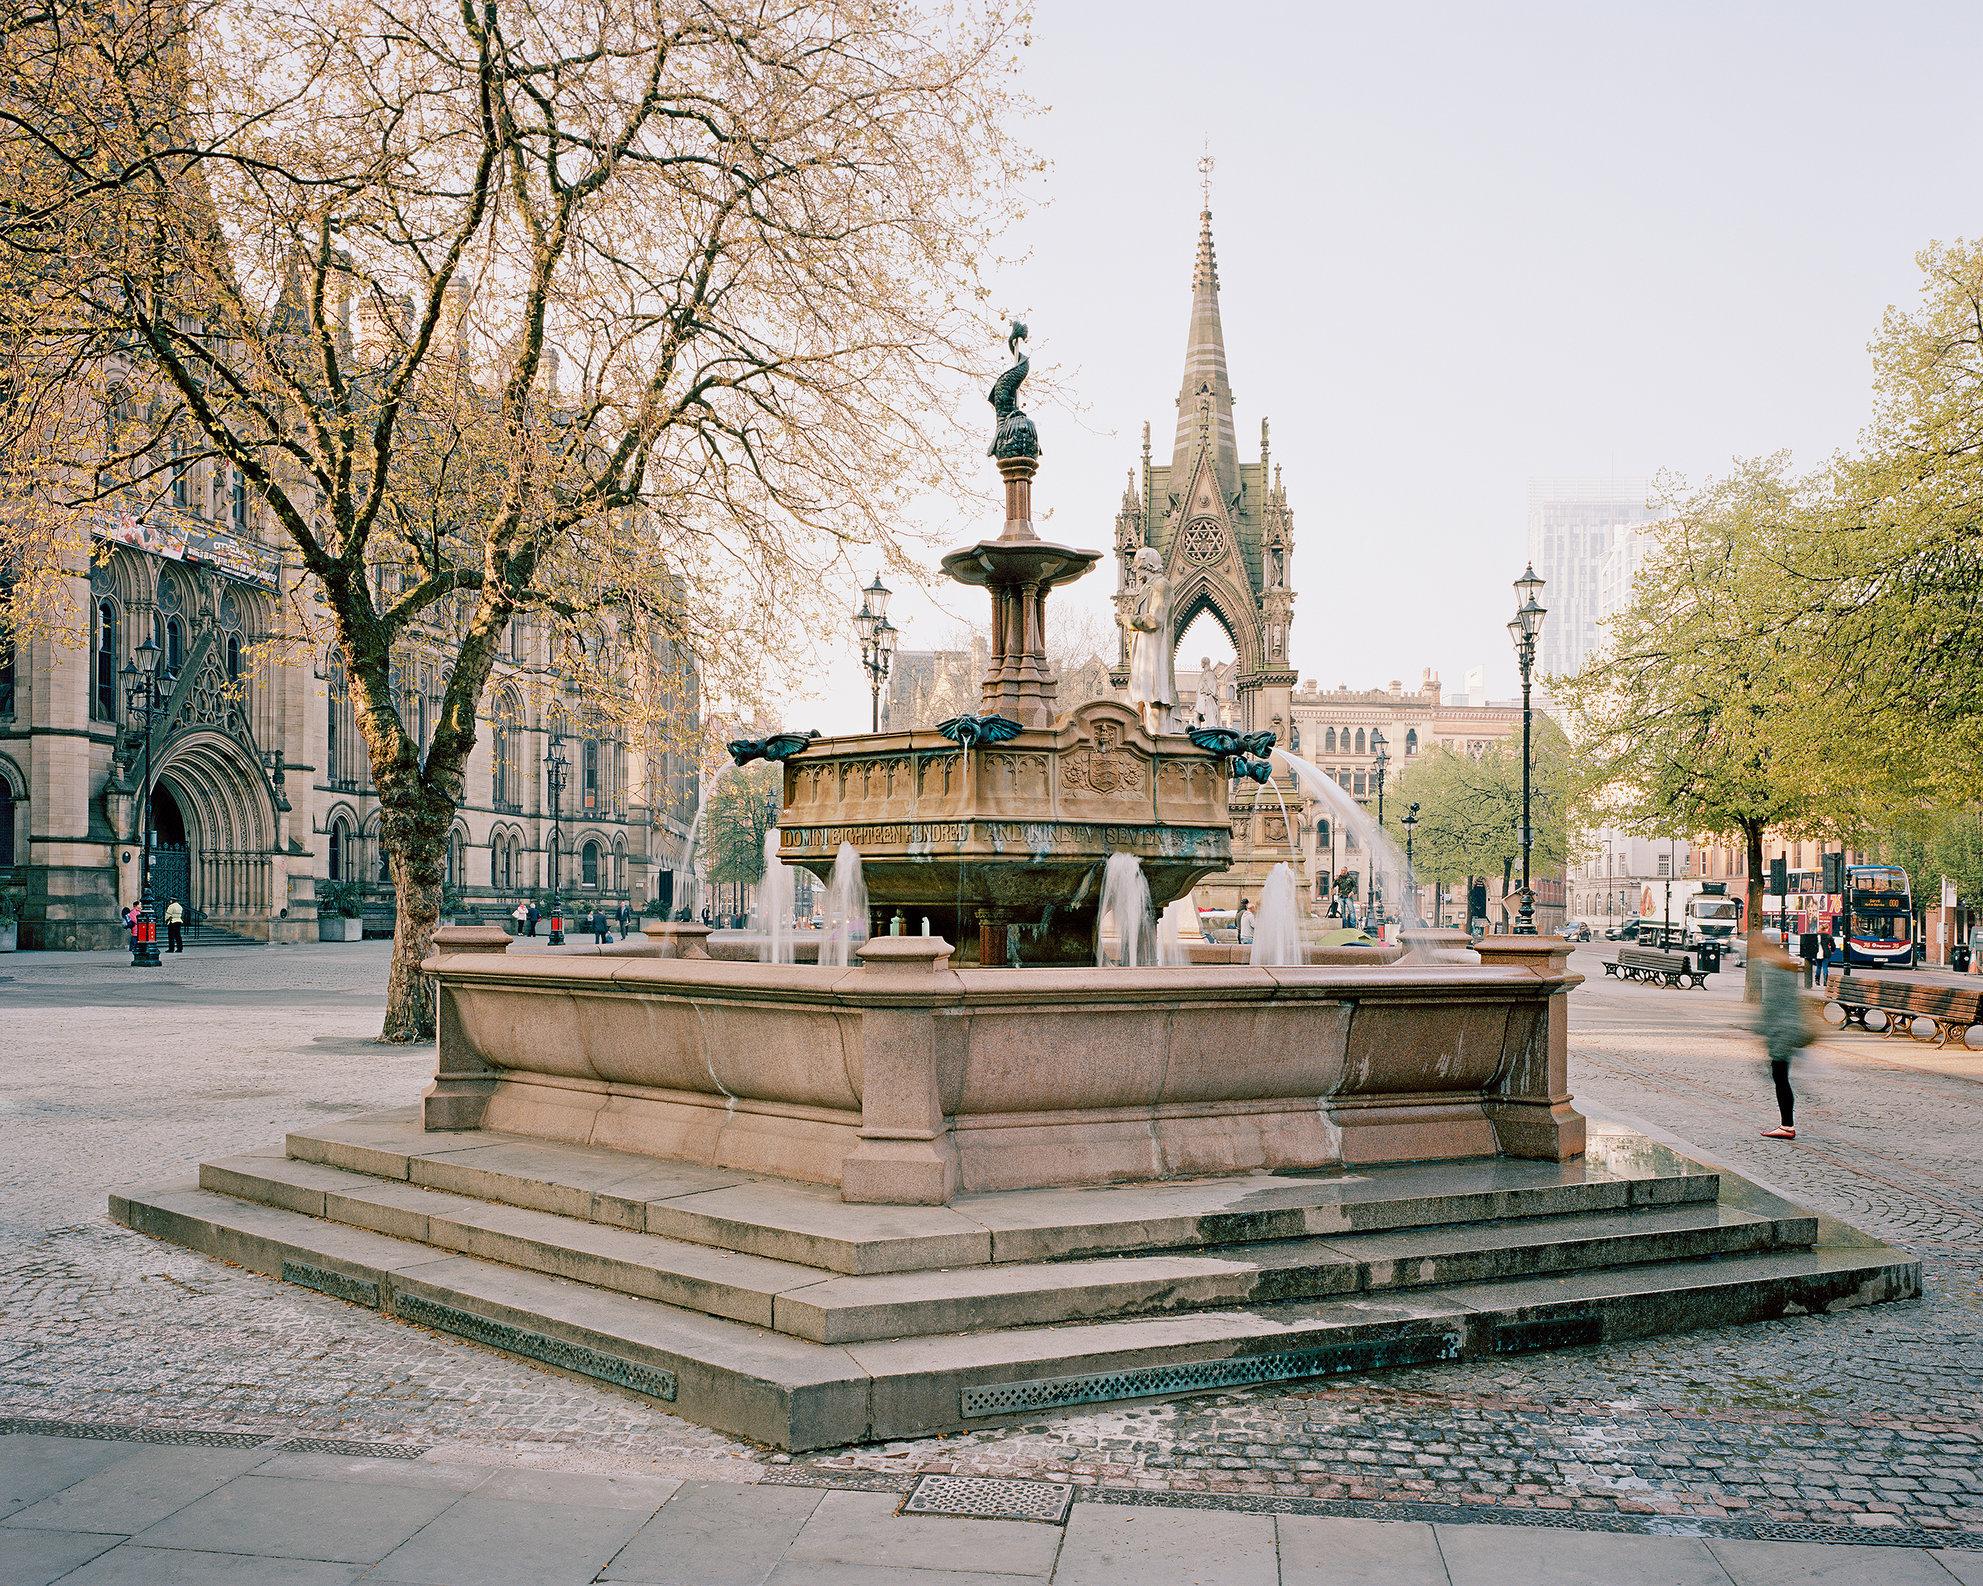 Jubilee Fountain, Albert Square, Manchester